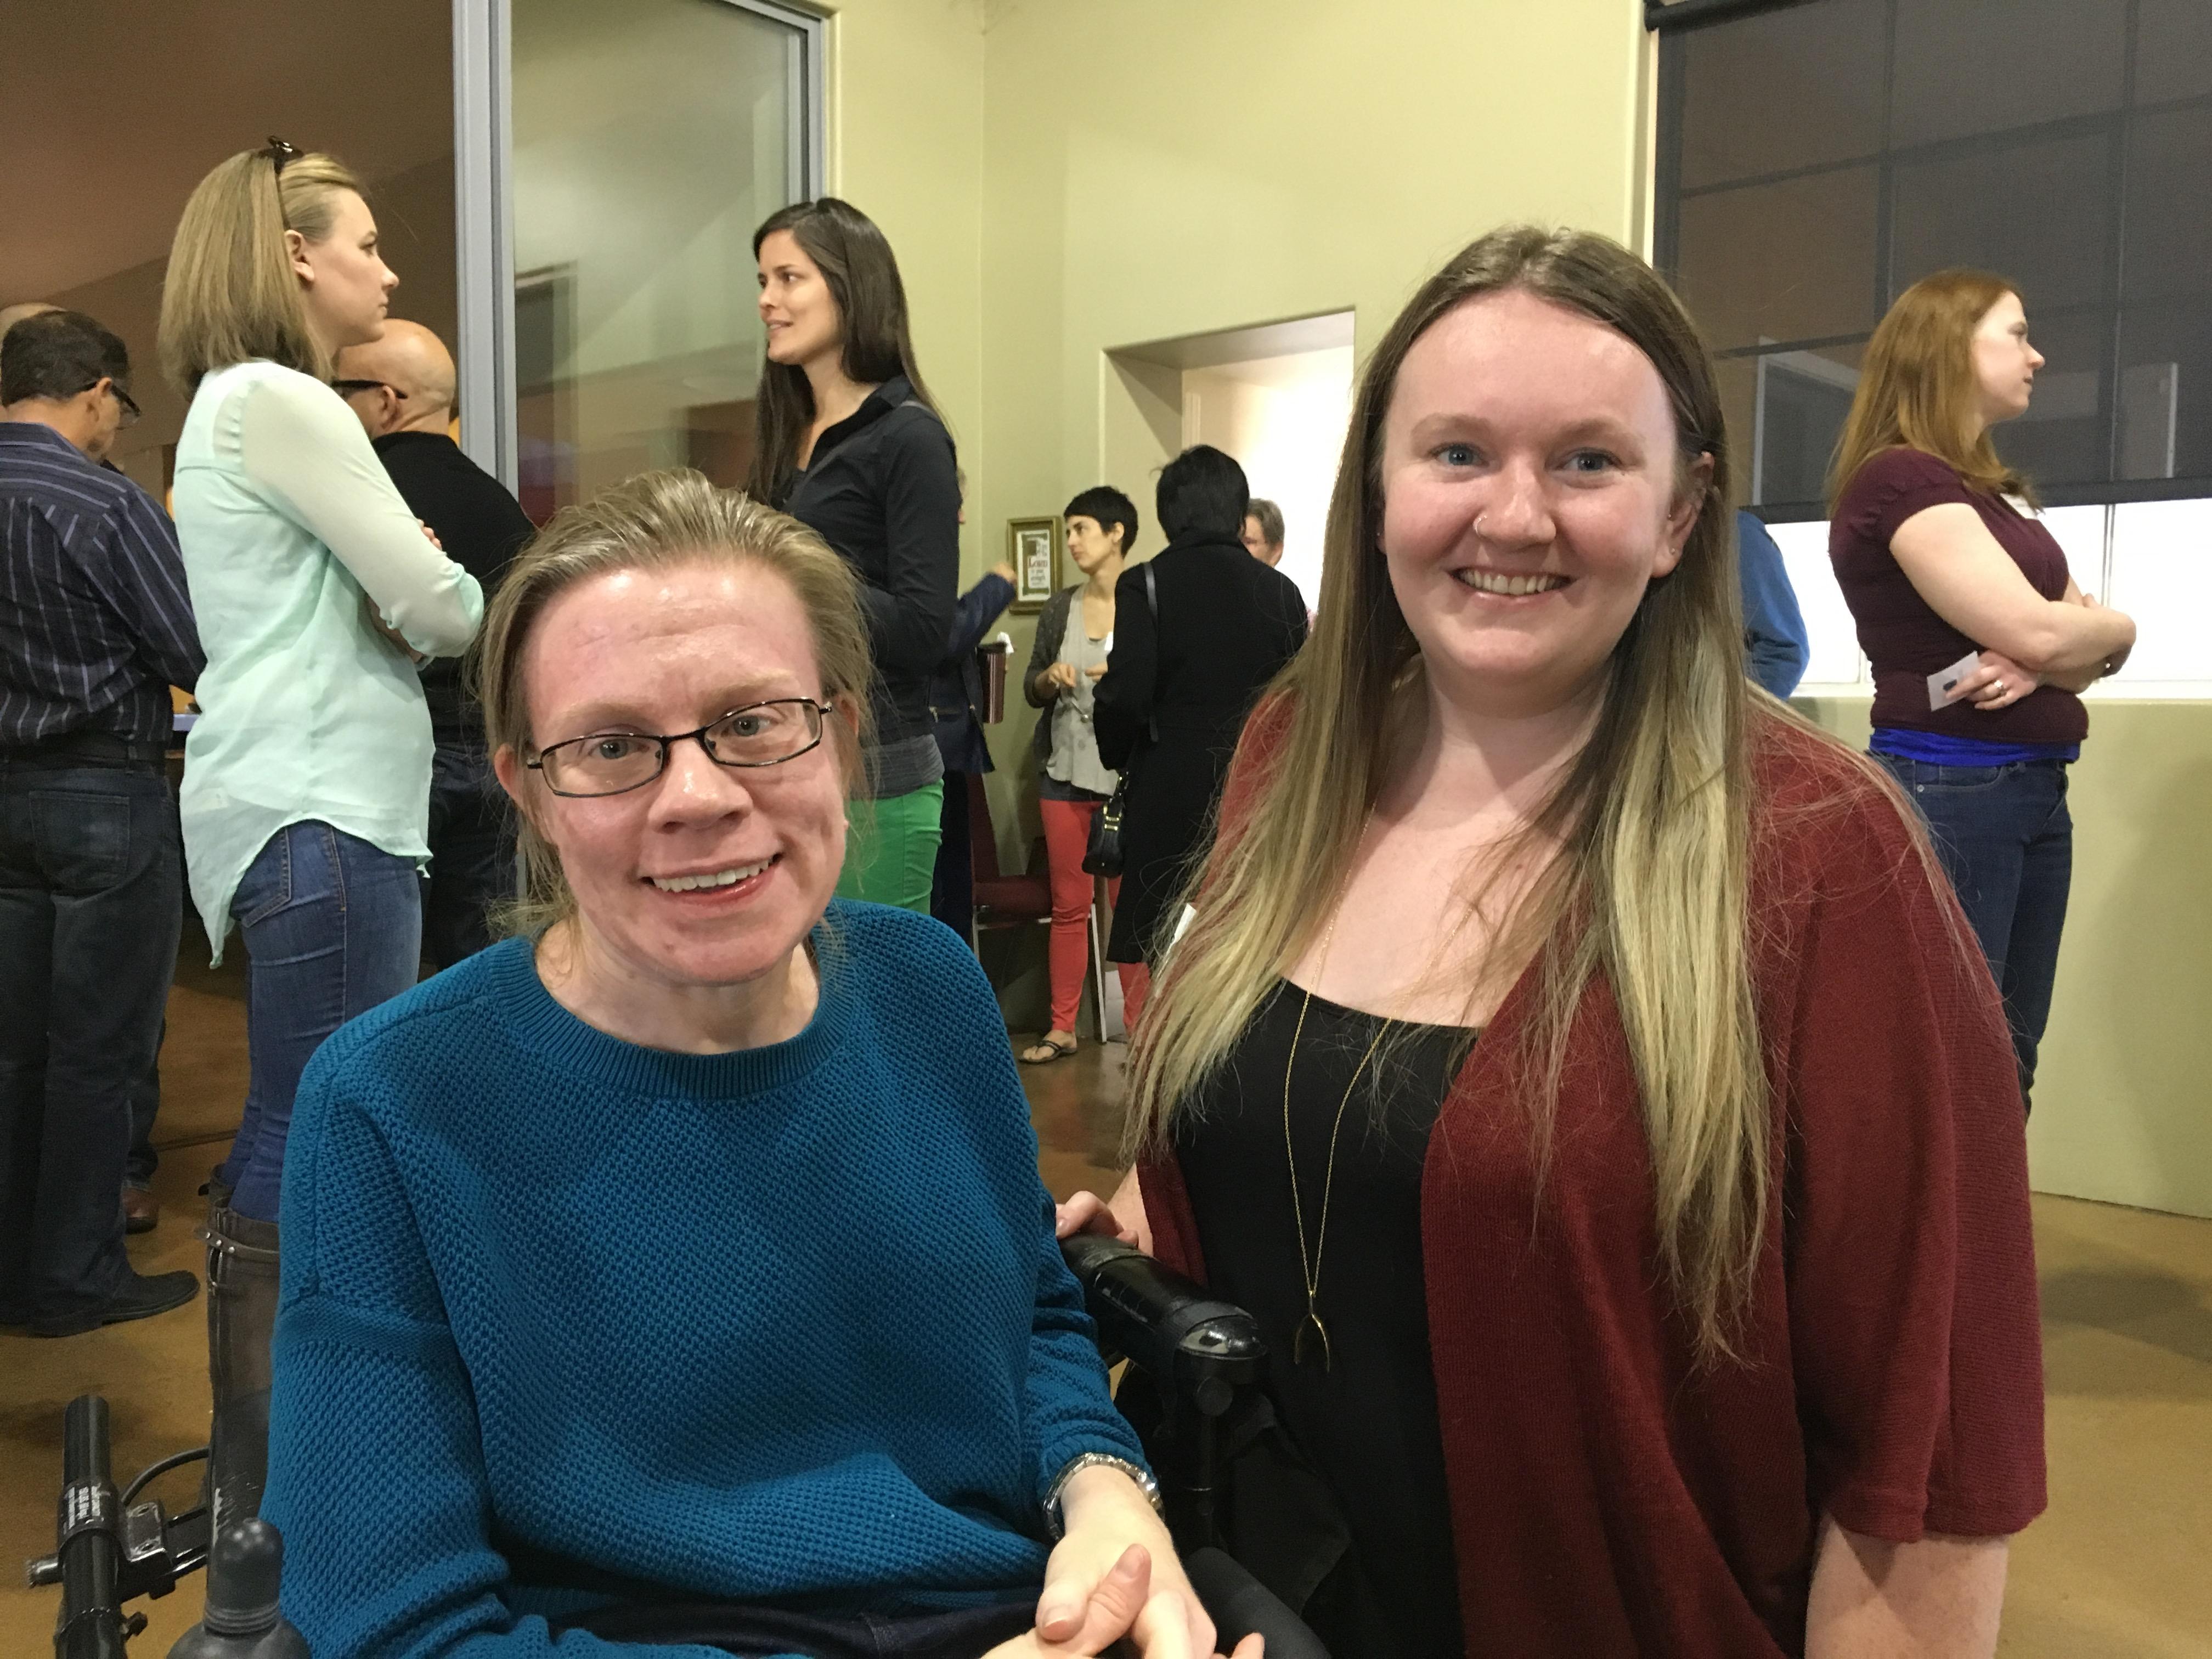 Sarah Potts (right) poses with Kara Kahnke (left).